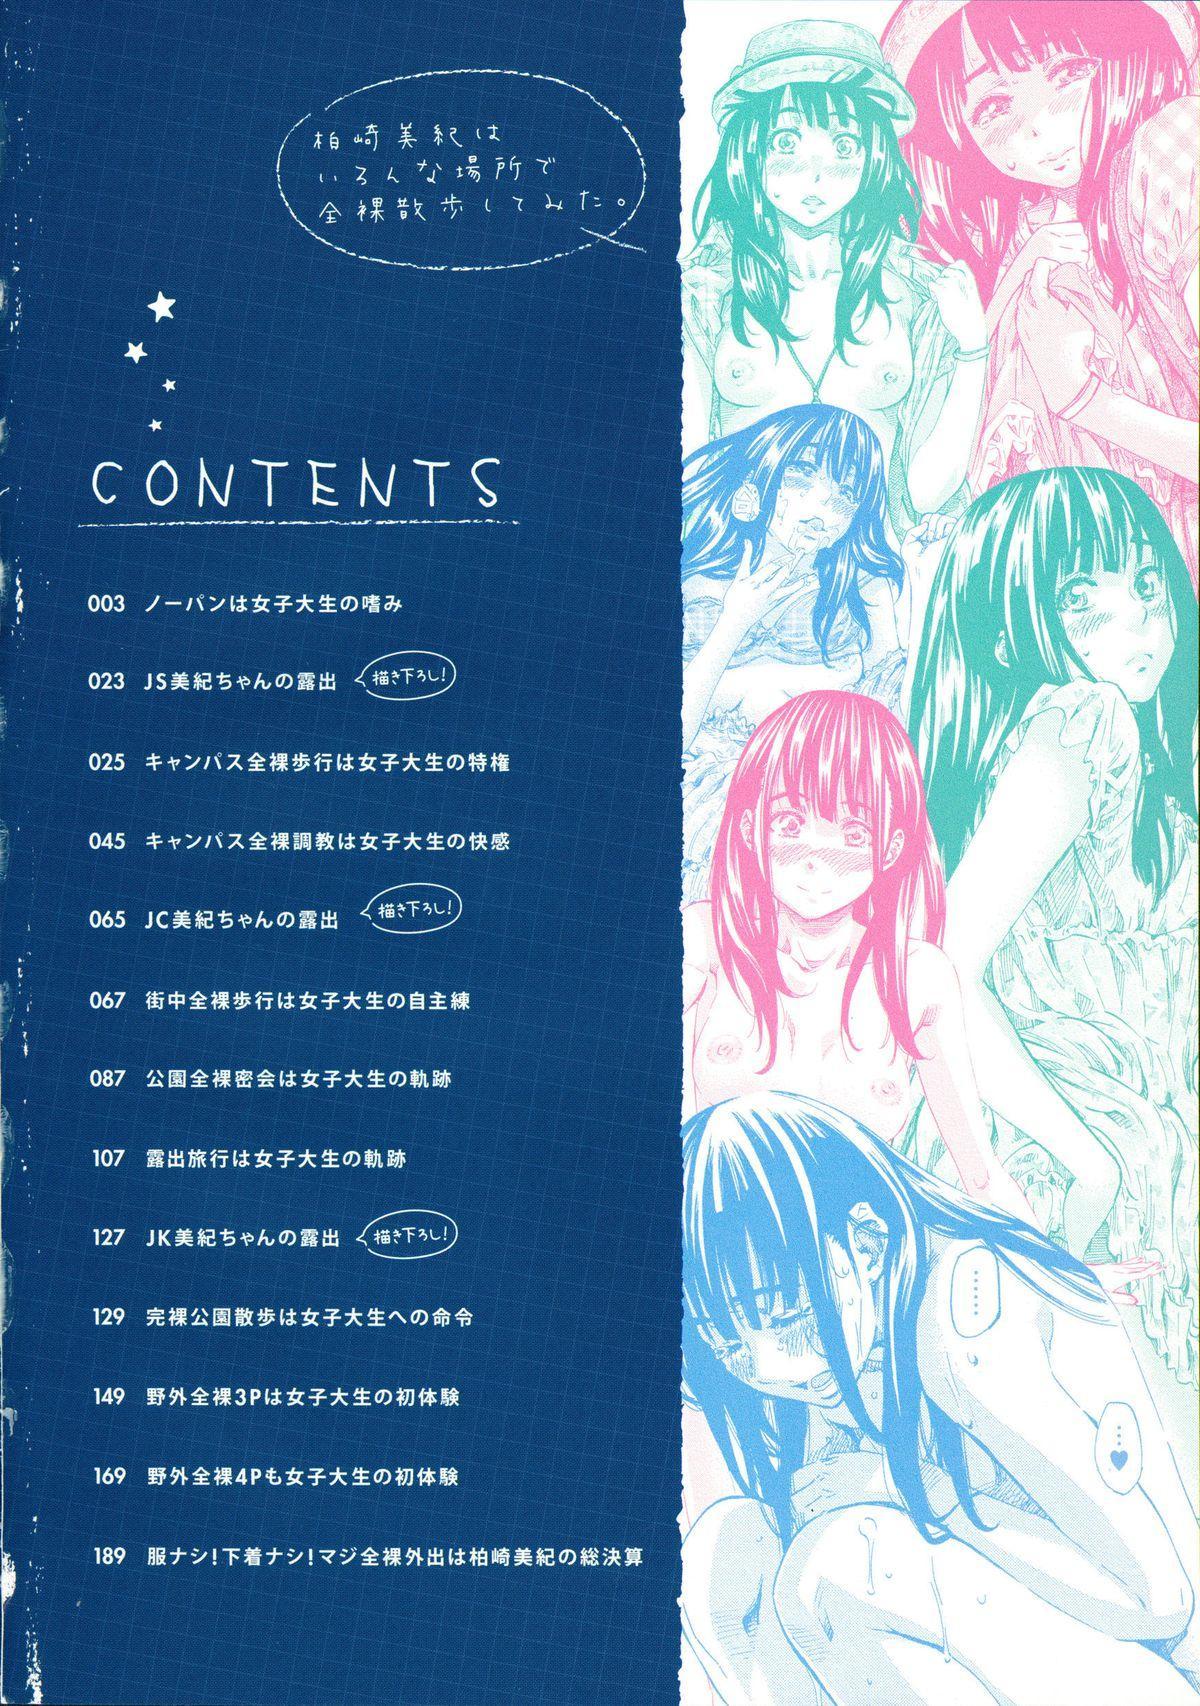 Kashiwazaki Miki wa Ironna Basho de Zenra Sanpo Shitemita   Miki Kashiwazaki Goes Naked in All Sorts of Places Ch. 1-4 5